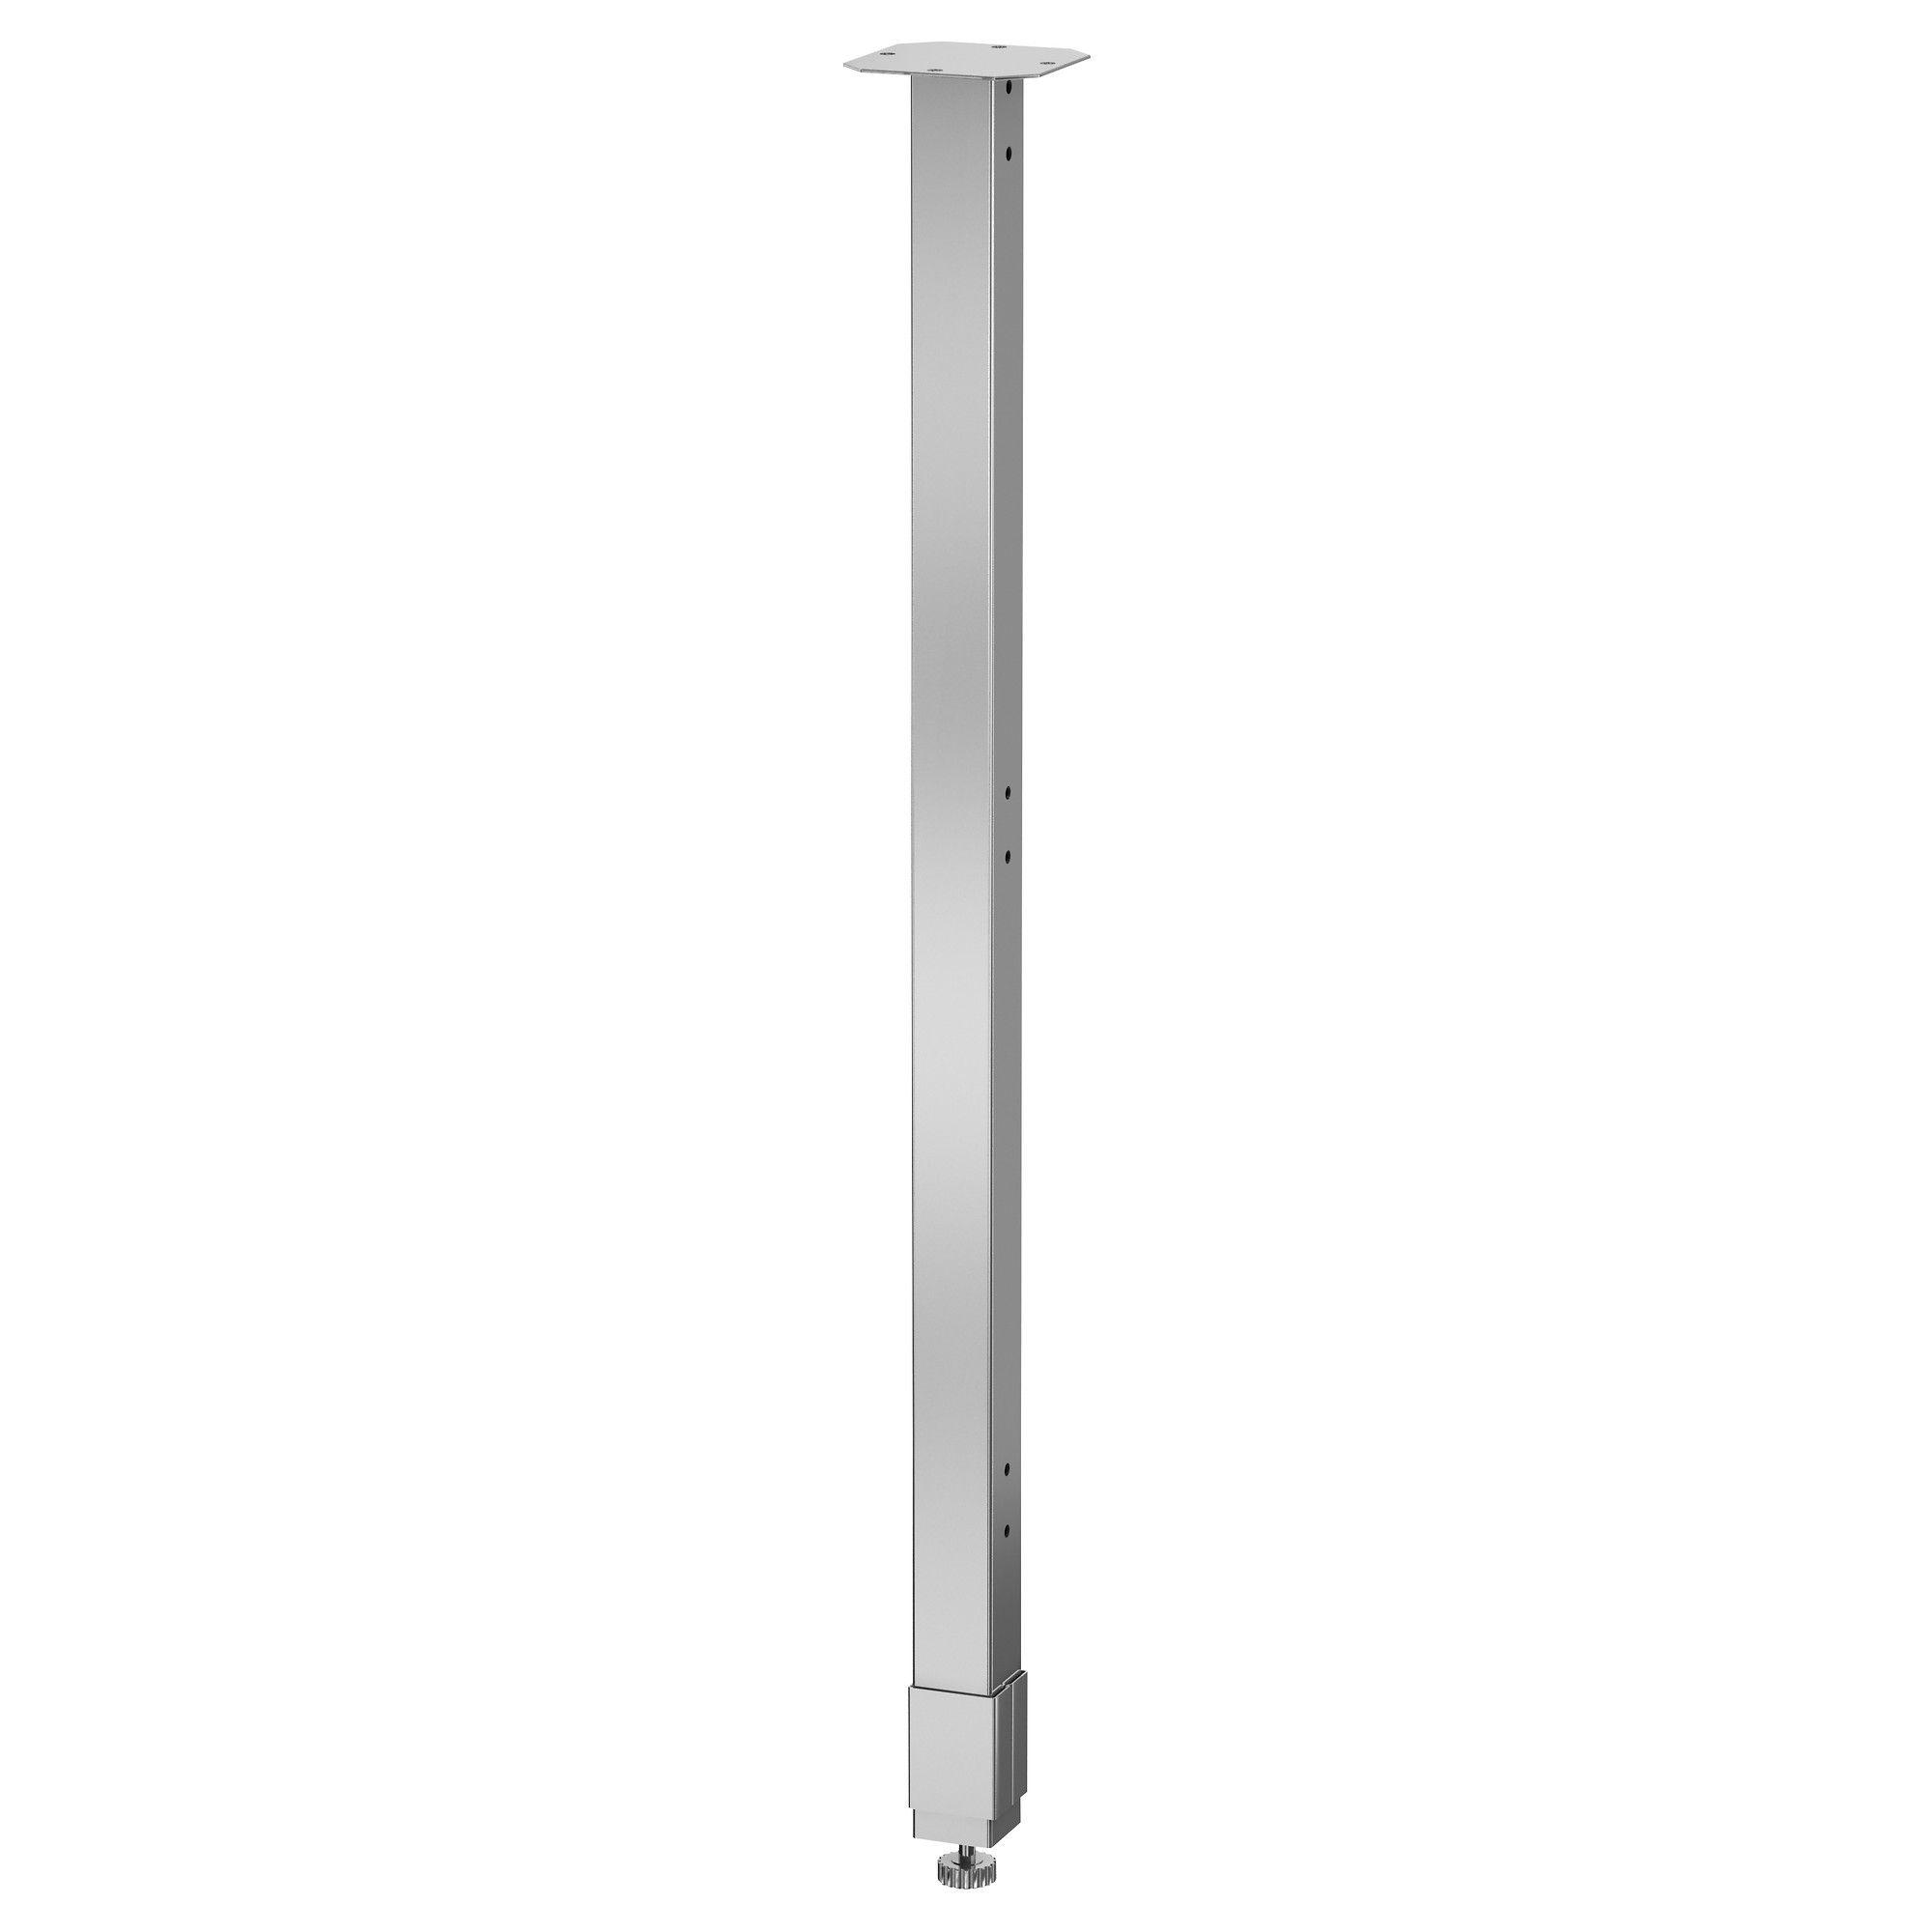 Utby Leg Stainless Steel Decor Ikea Bench Legs